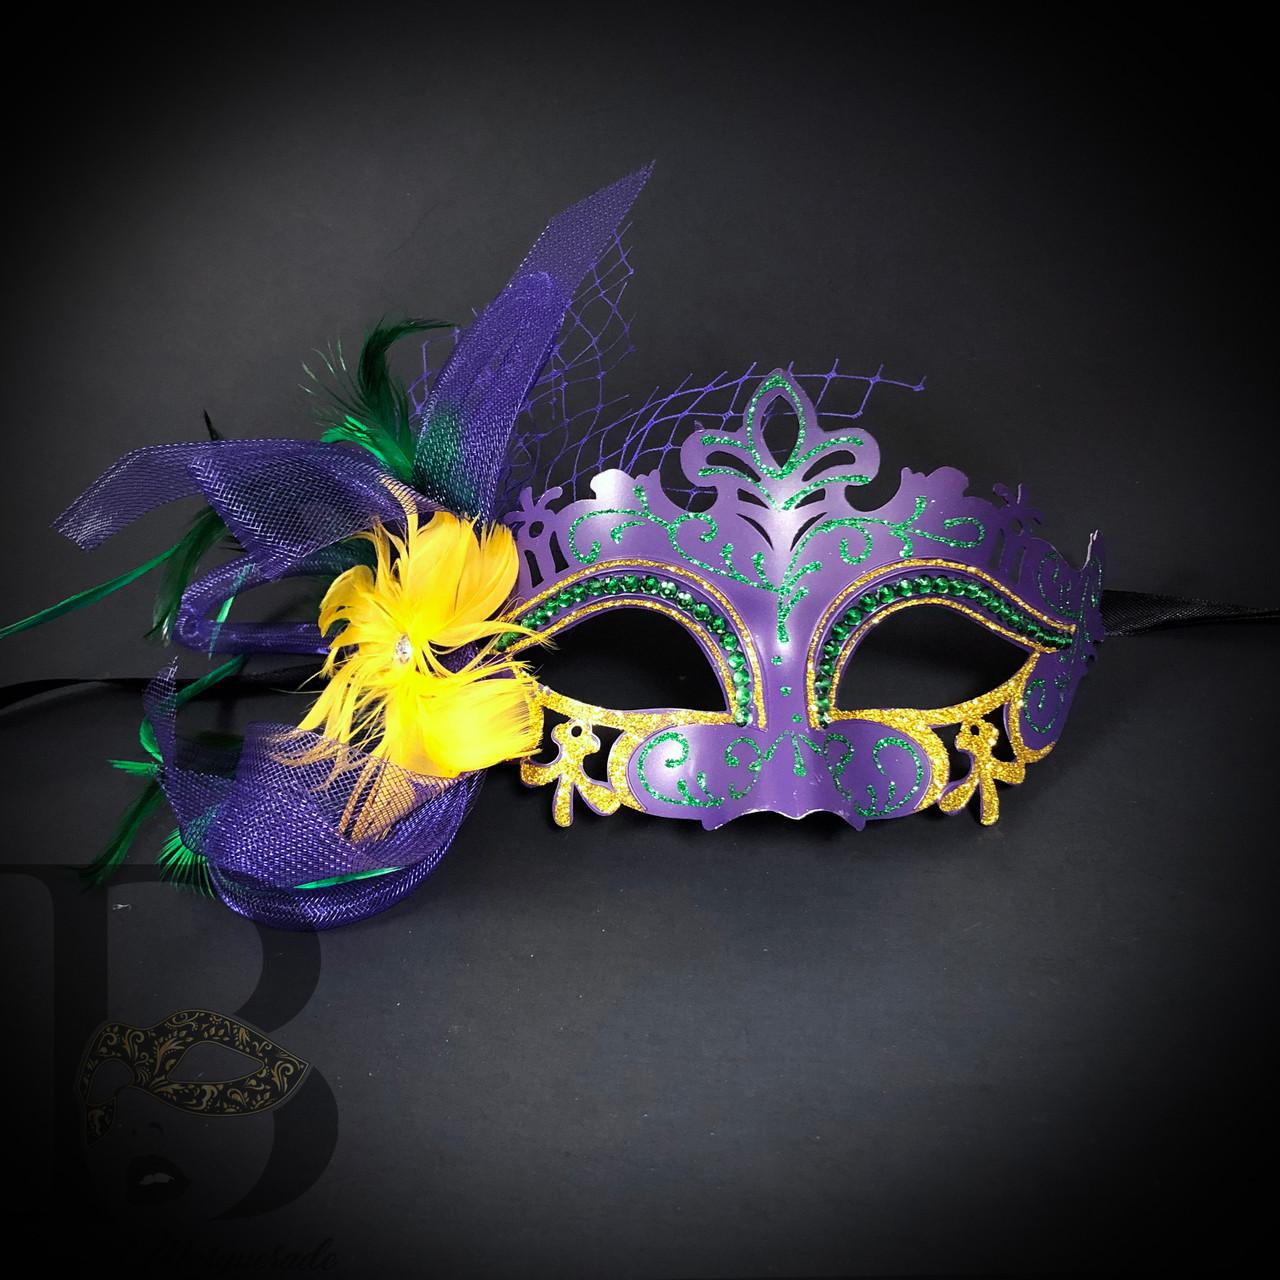 Mardi Gras Masquerade ball mask Purple Green Carnival Dress up Parade Party